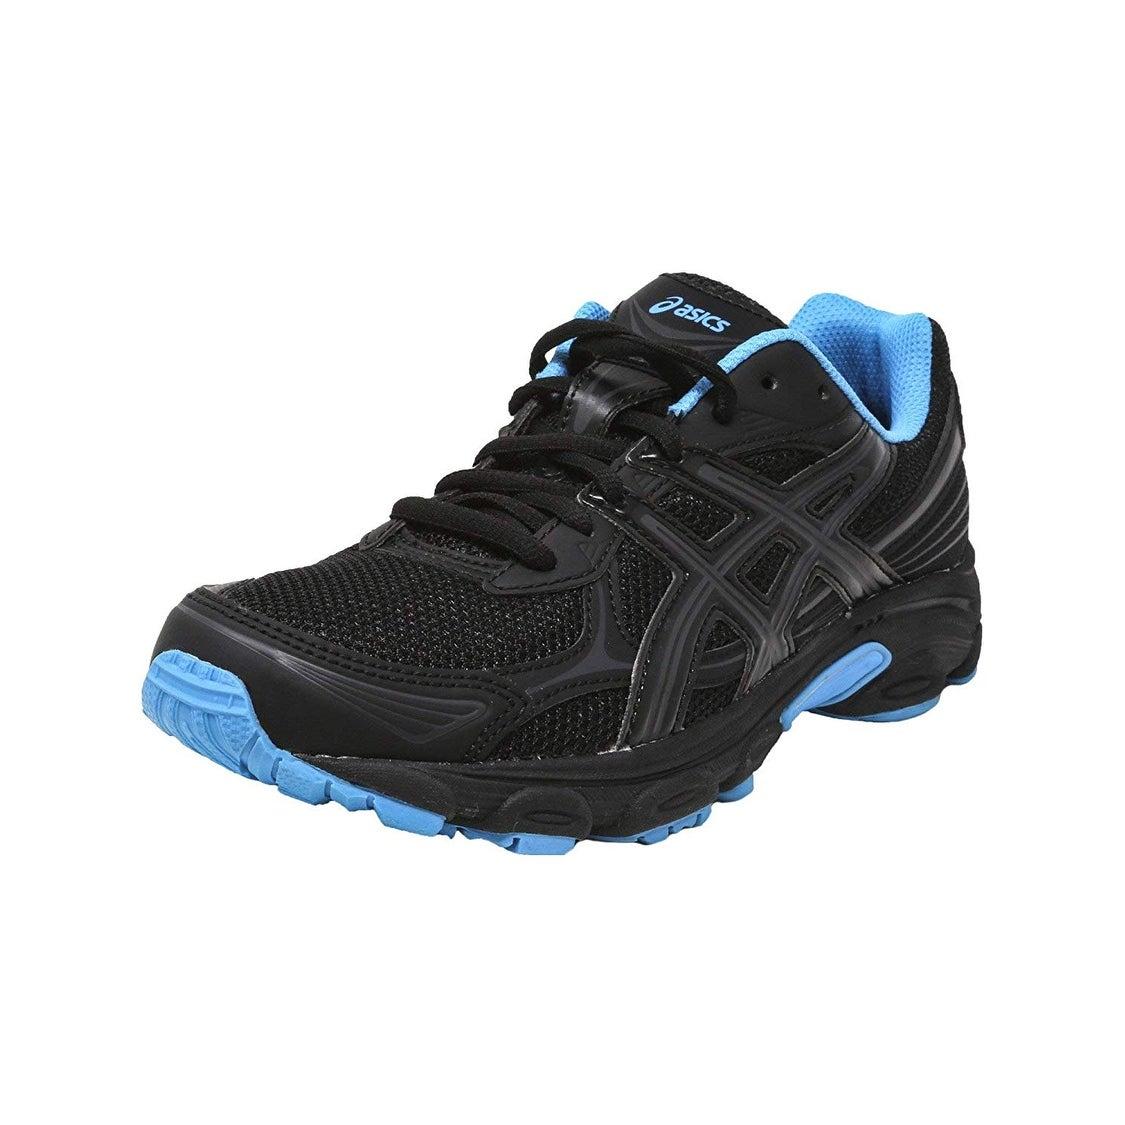 Asics ShoesShop Best Clothingamp; Online At Deals Our Overstock 5AL3jRqc4